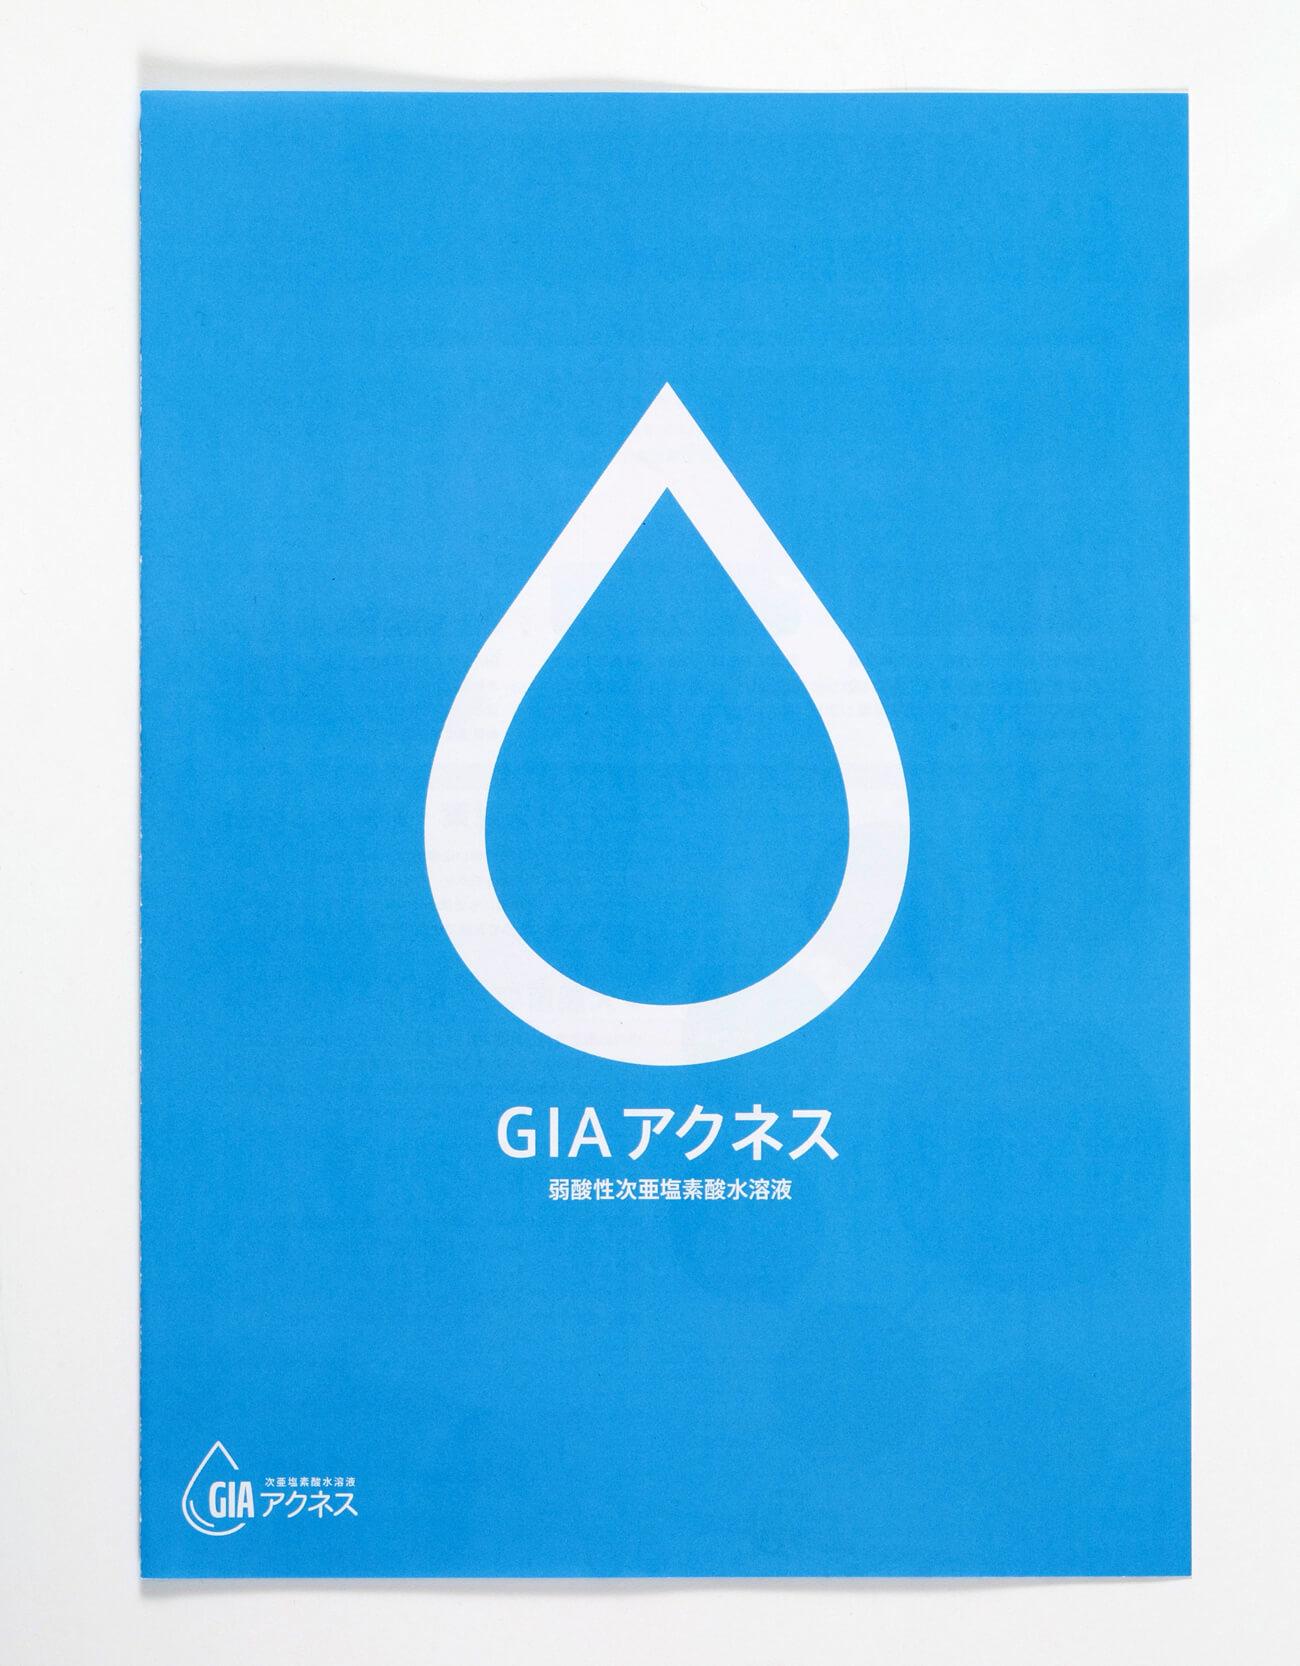 GIAアクネス パンフレット制作1